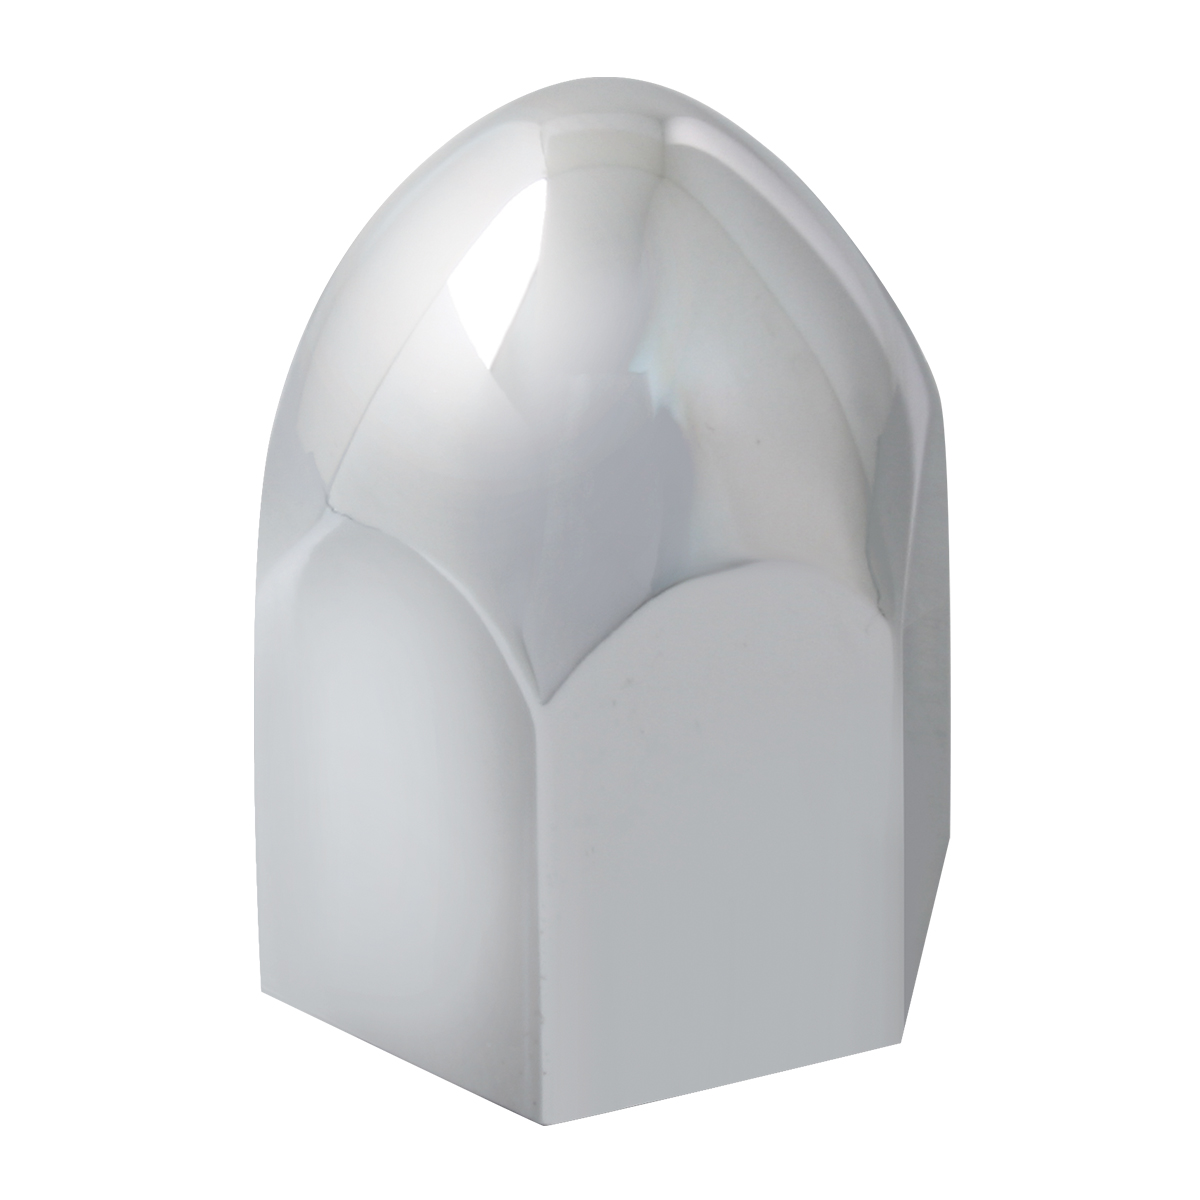 Bullet Shape Push-On Lug Nut Cover without Flange